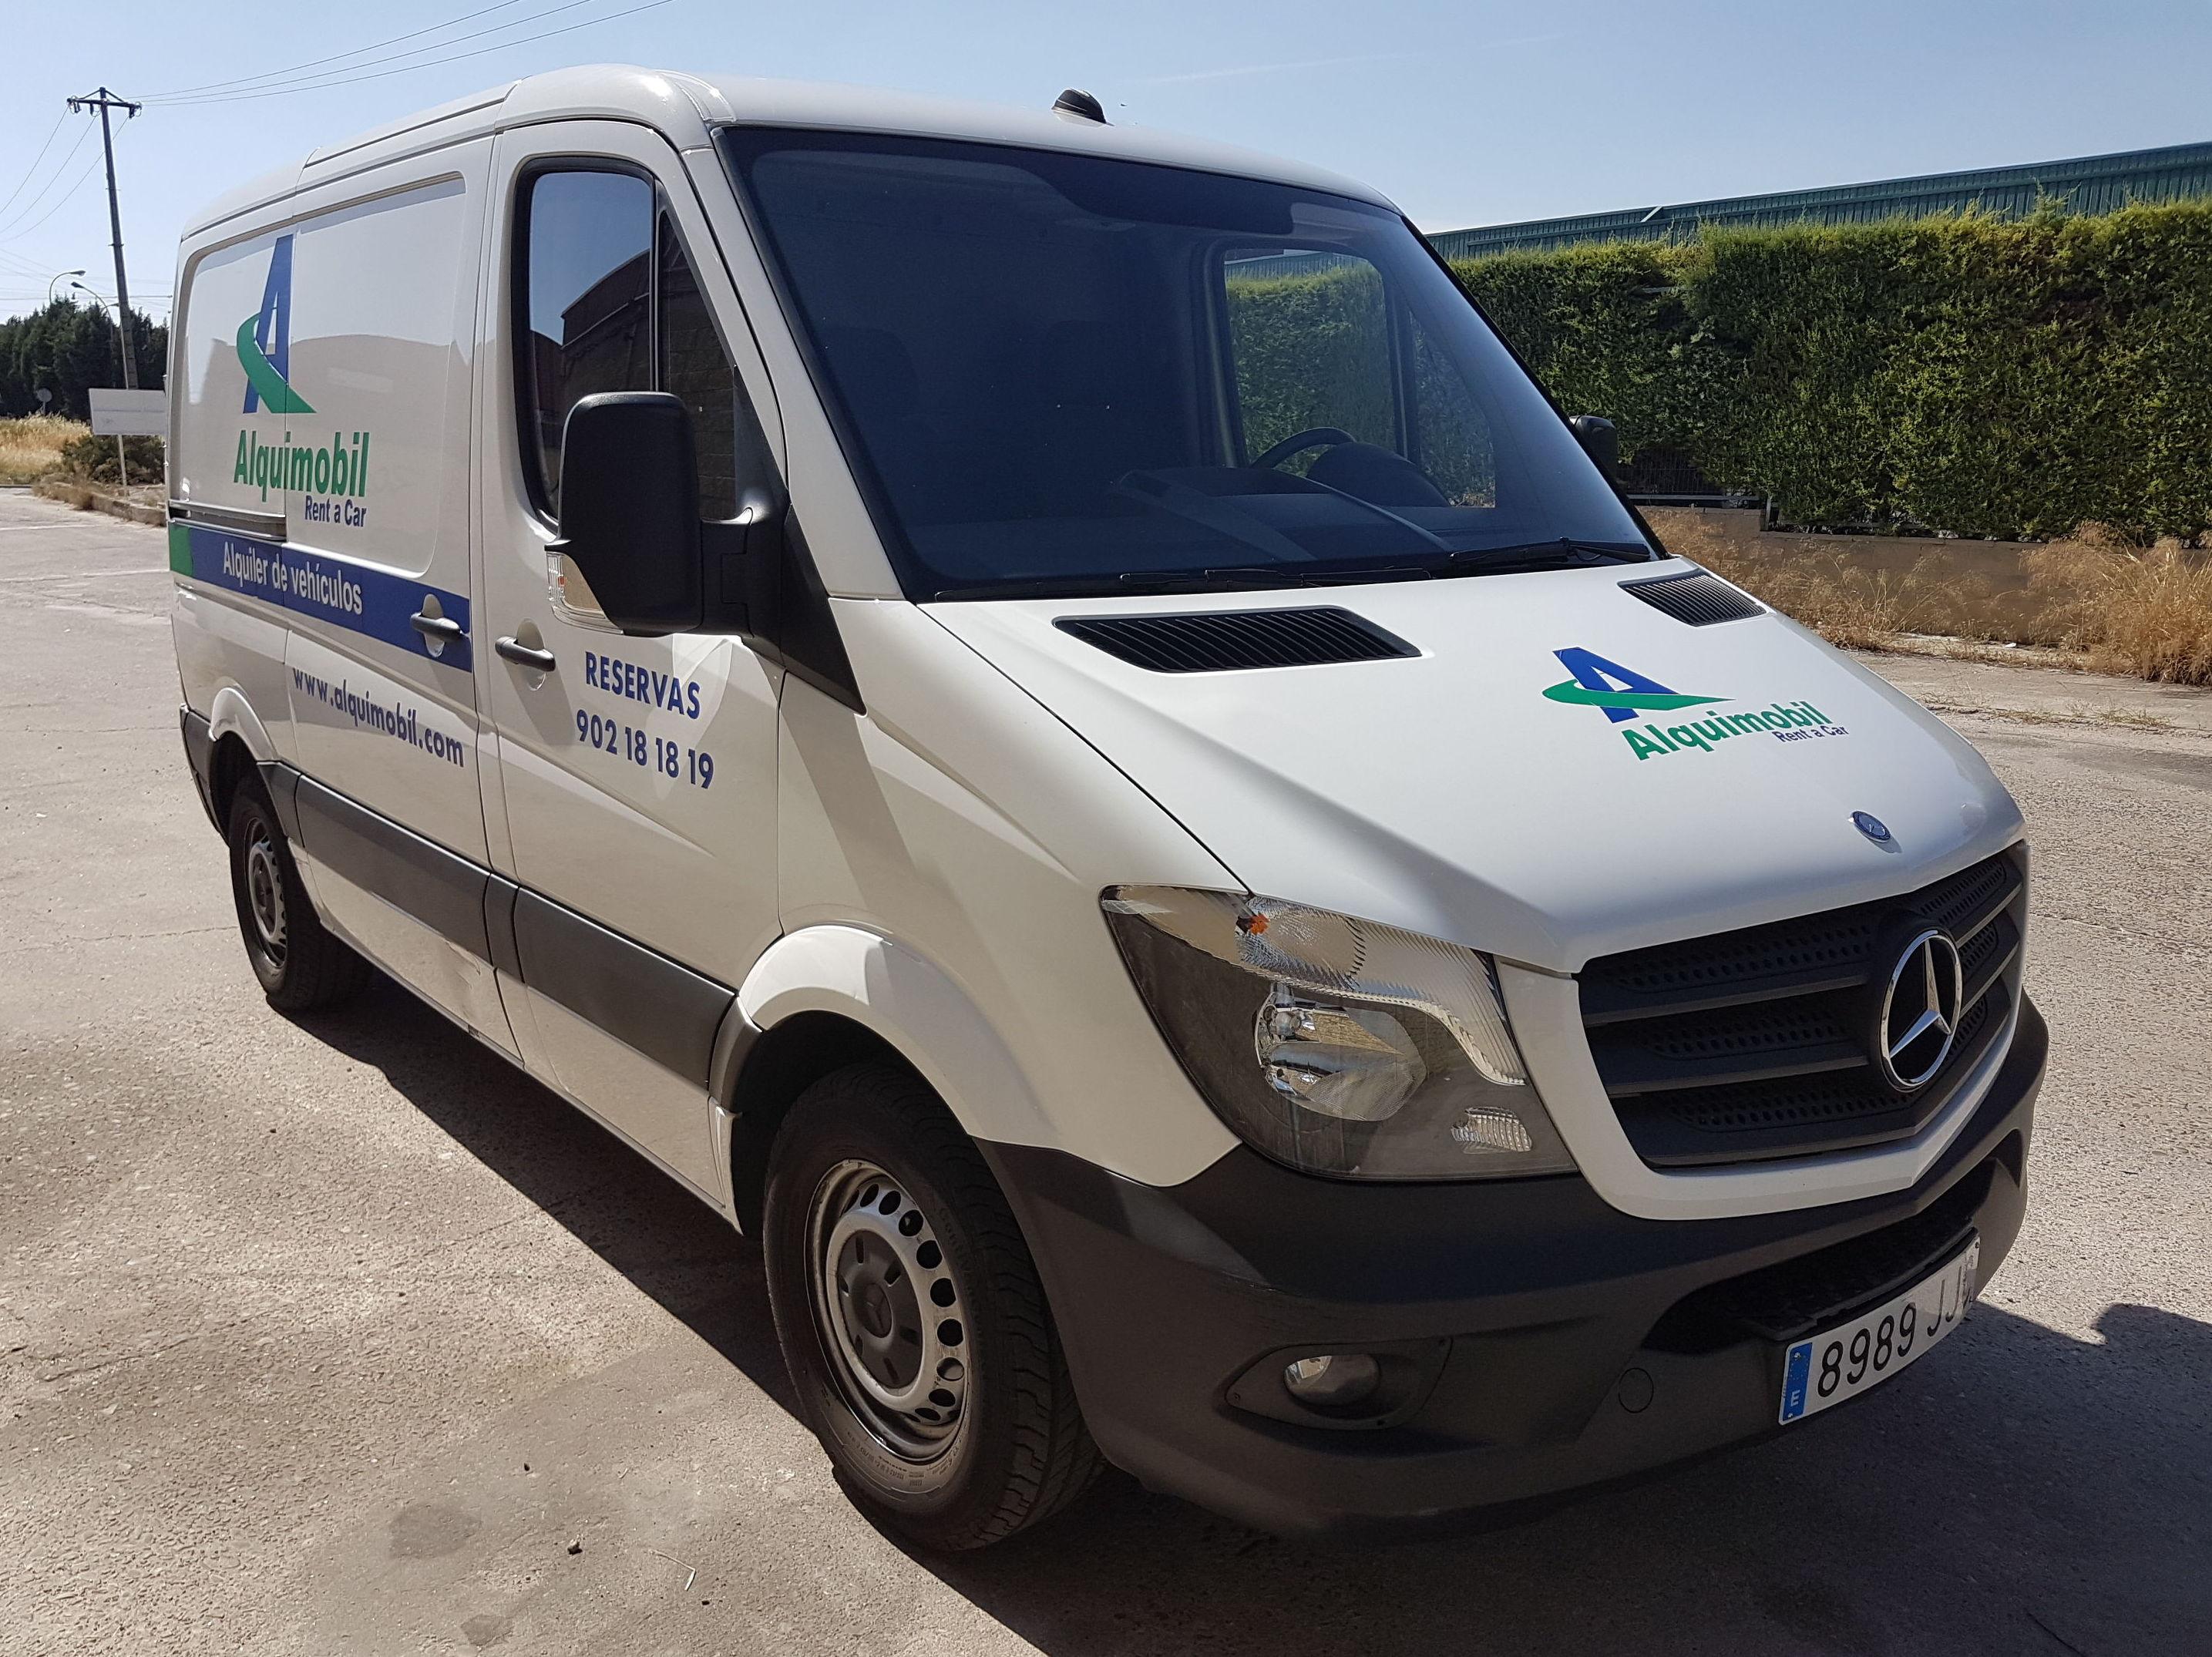 Alquiler de furgonetas en Alcobendas